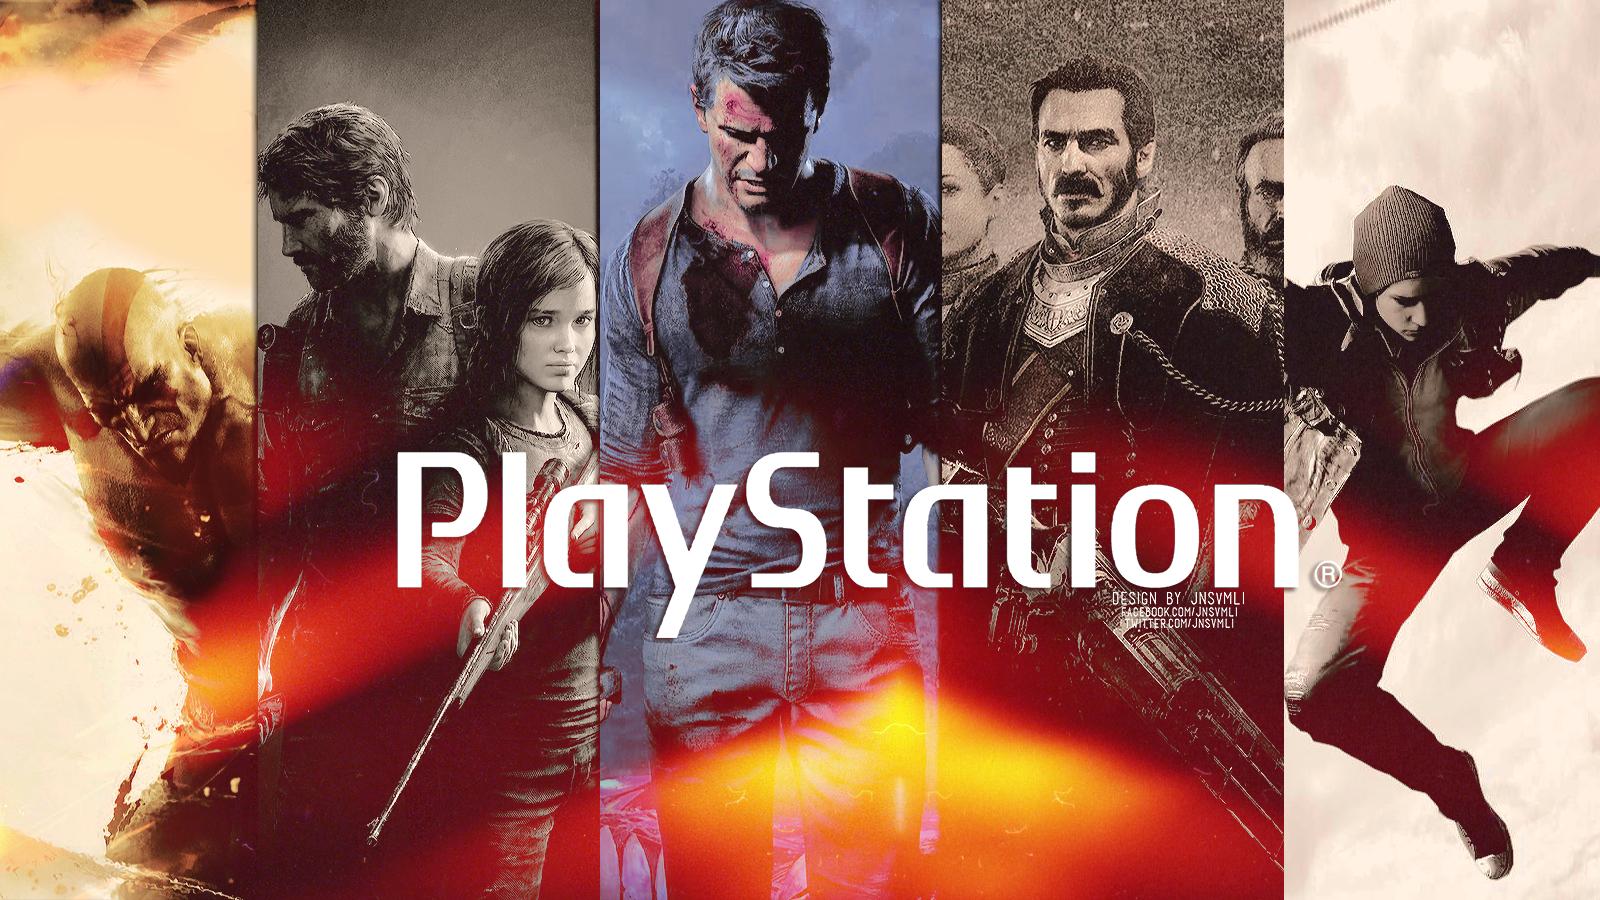 ... PlayStation Wallpaper - 2015 by JNSVMLI by jnsvmli